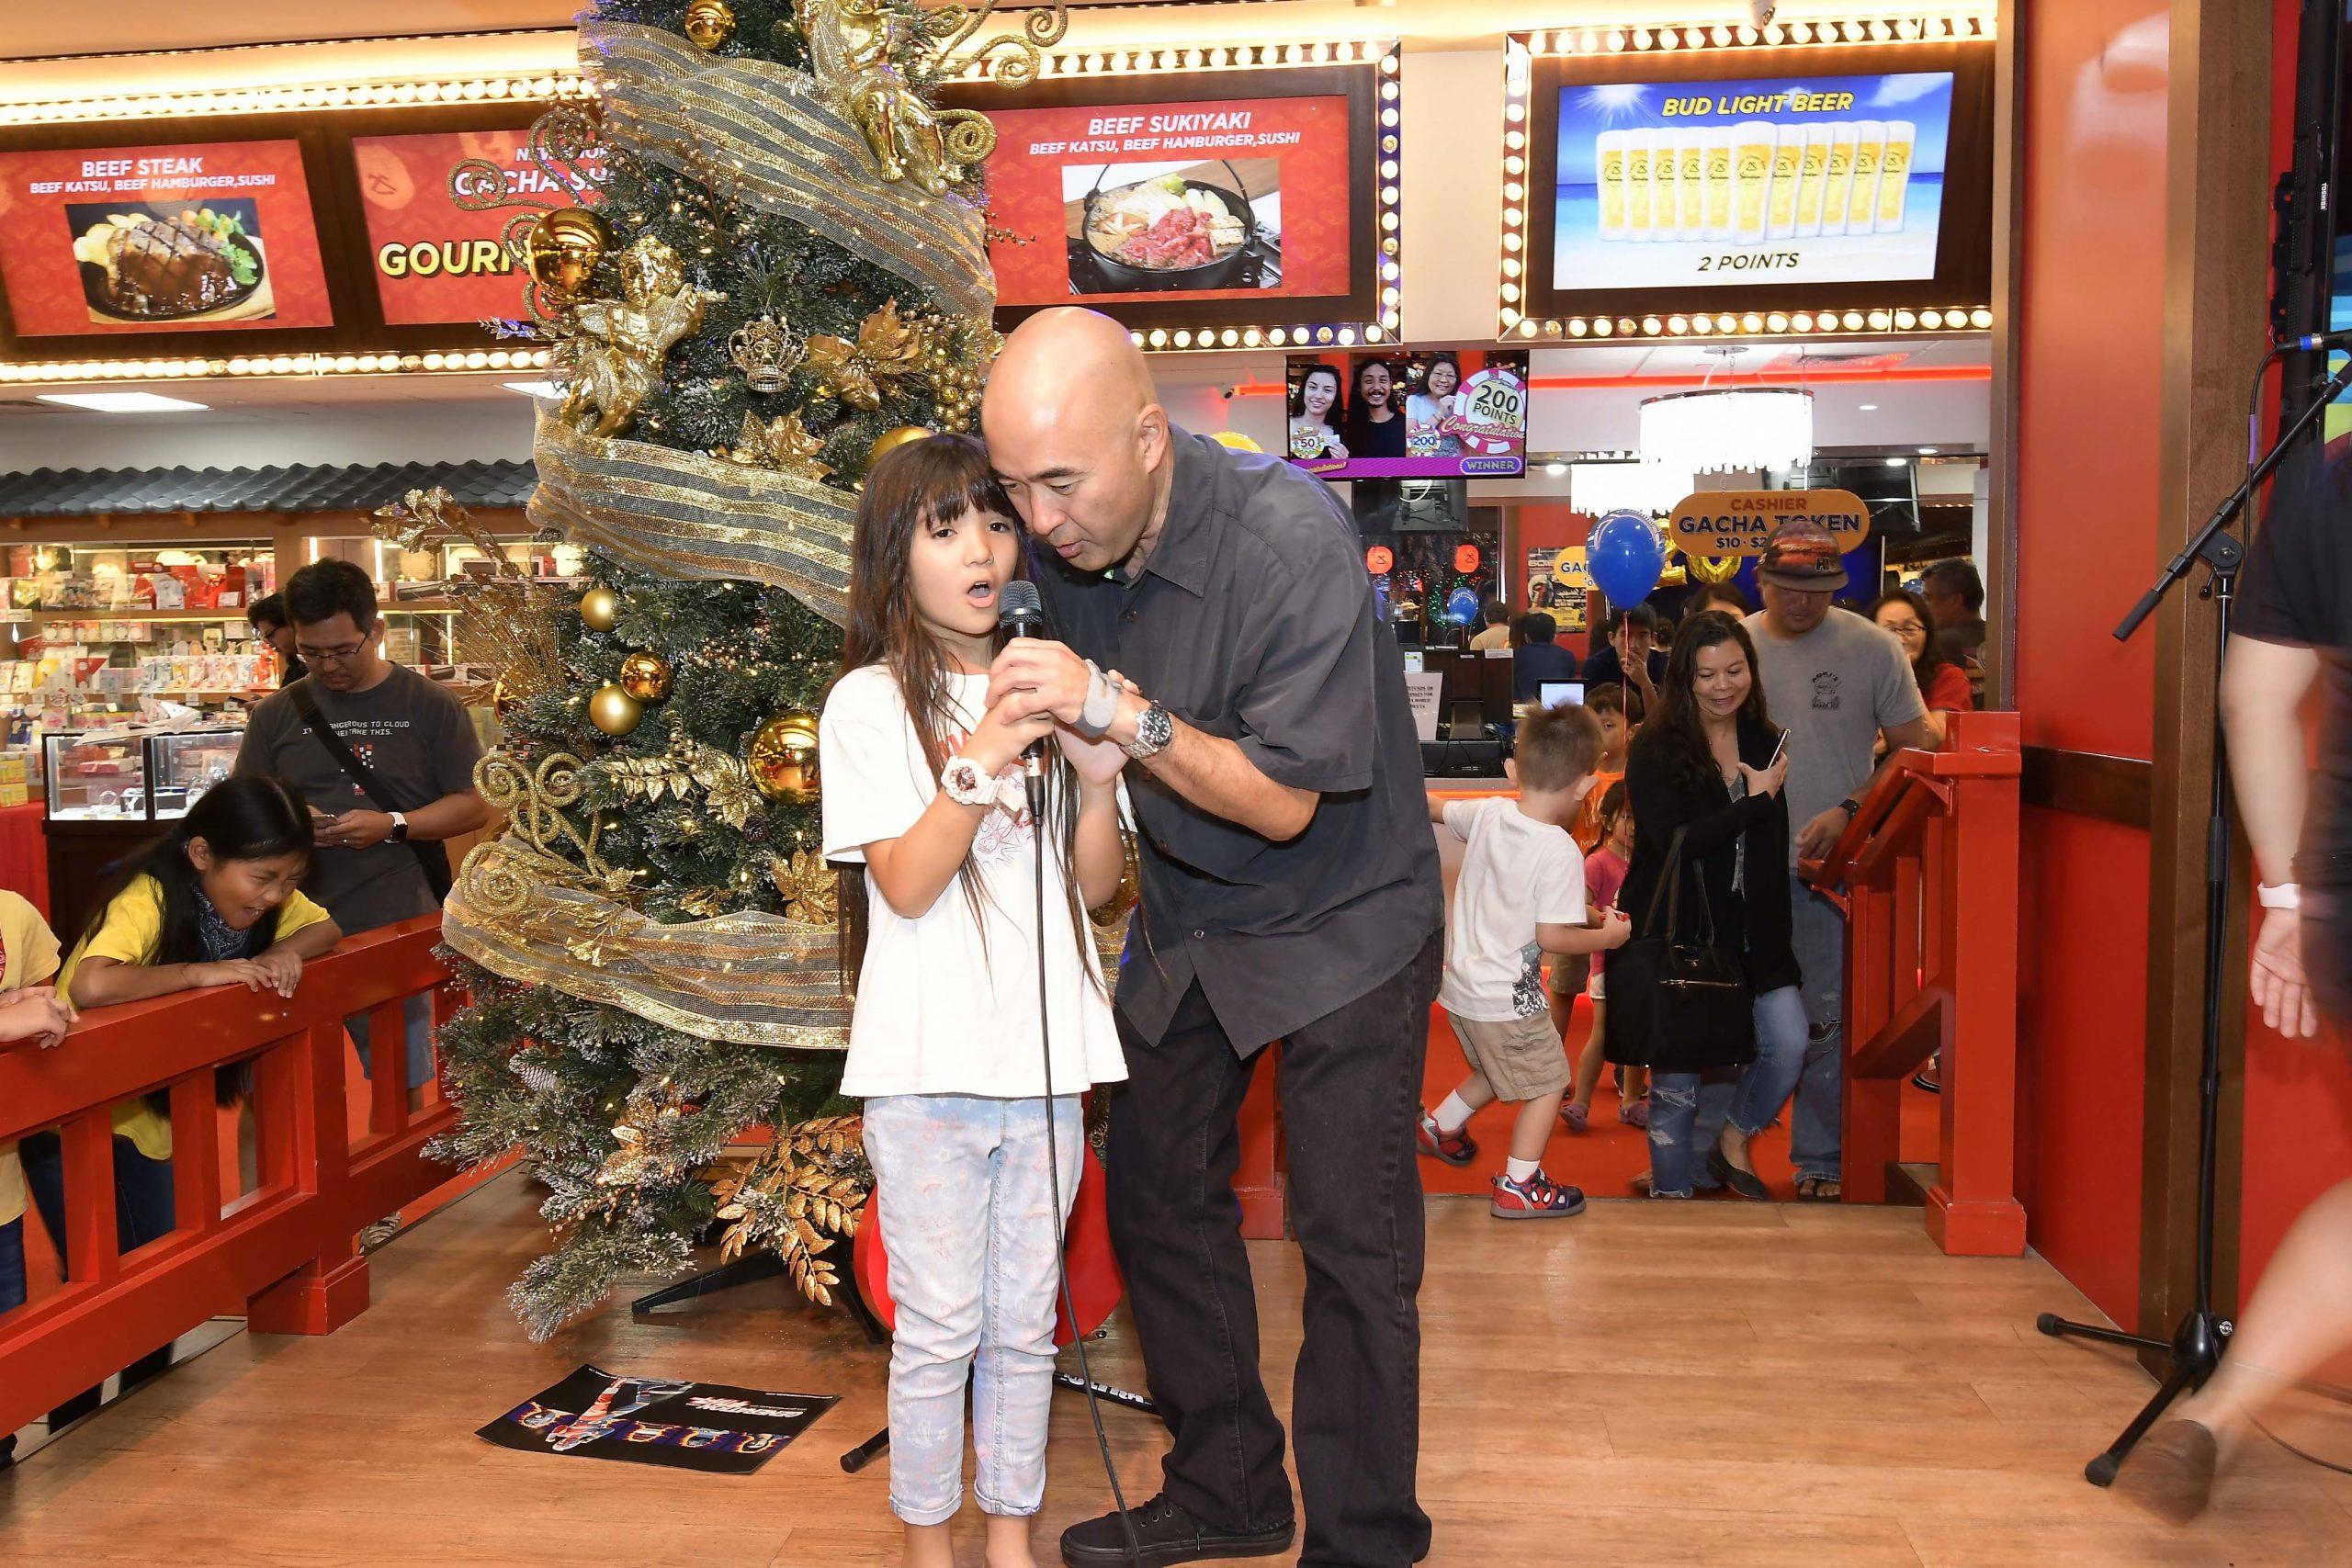 Kikaida fans Maggie Inouye and her dad Ken sing the Kikaida theme song together.